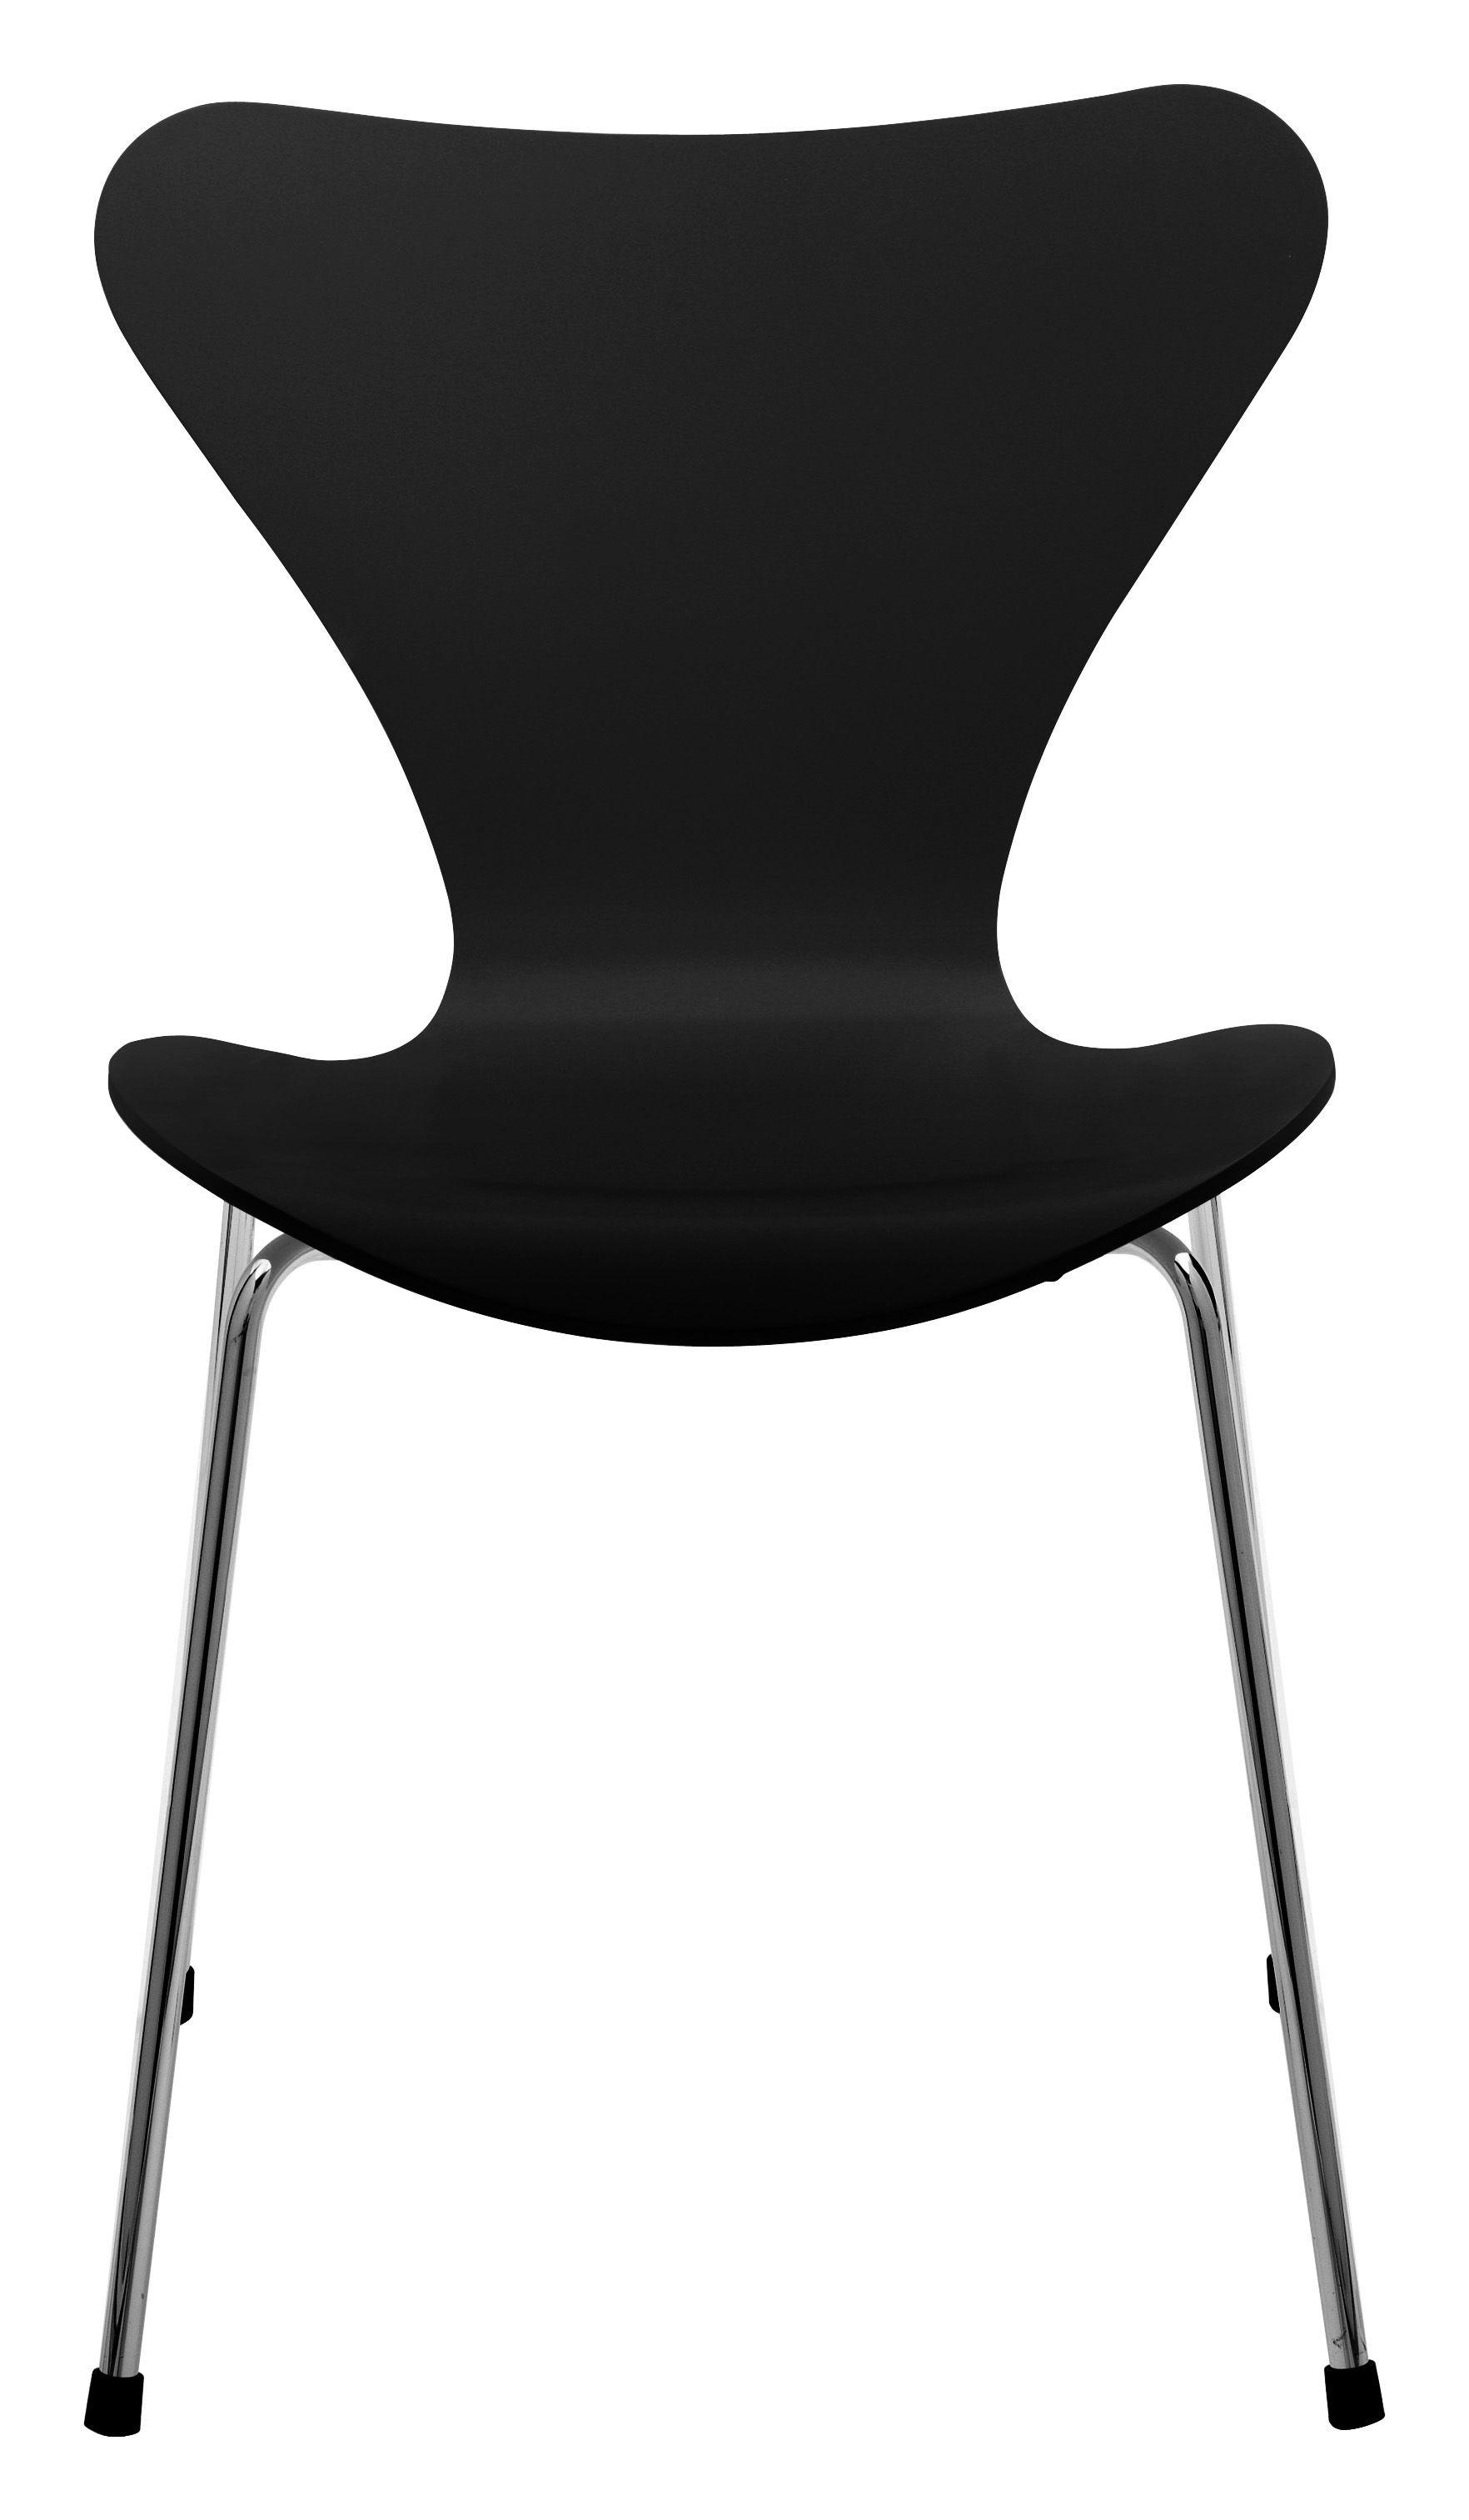 s rie 7 esche fritz hansen stuhl. Black Bedroom Furniture Sets. Home Design Ideas